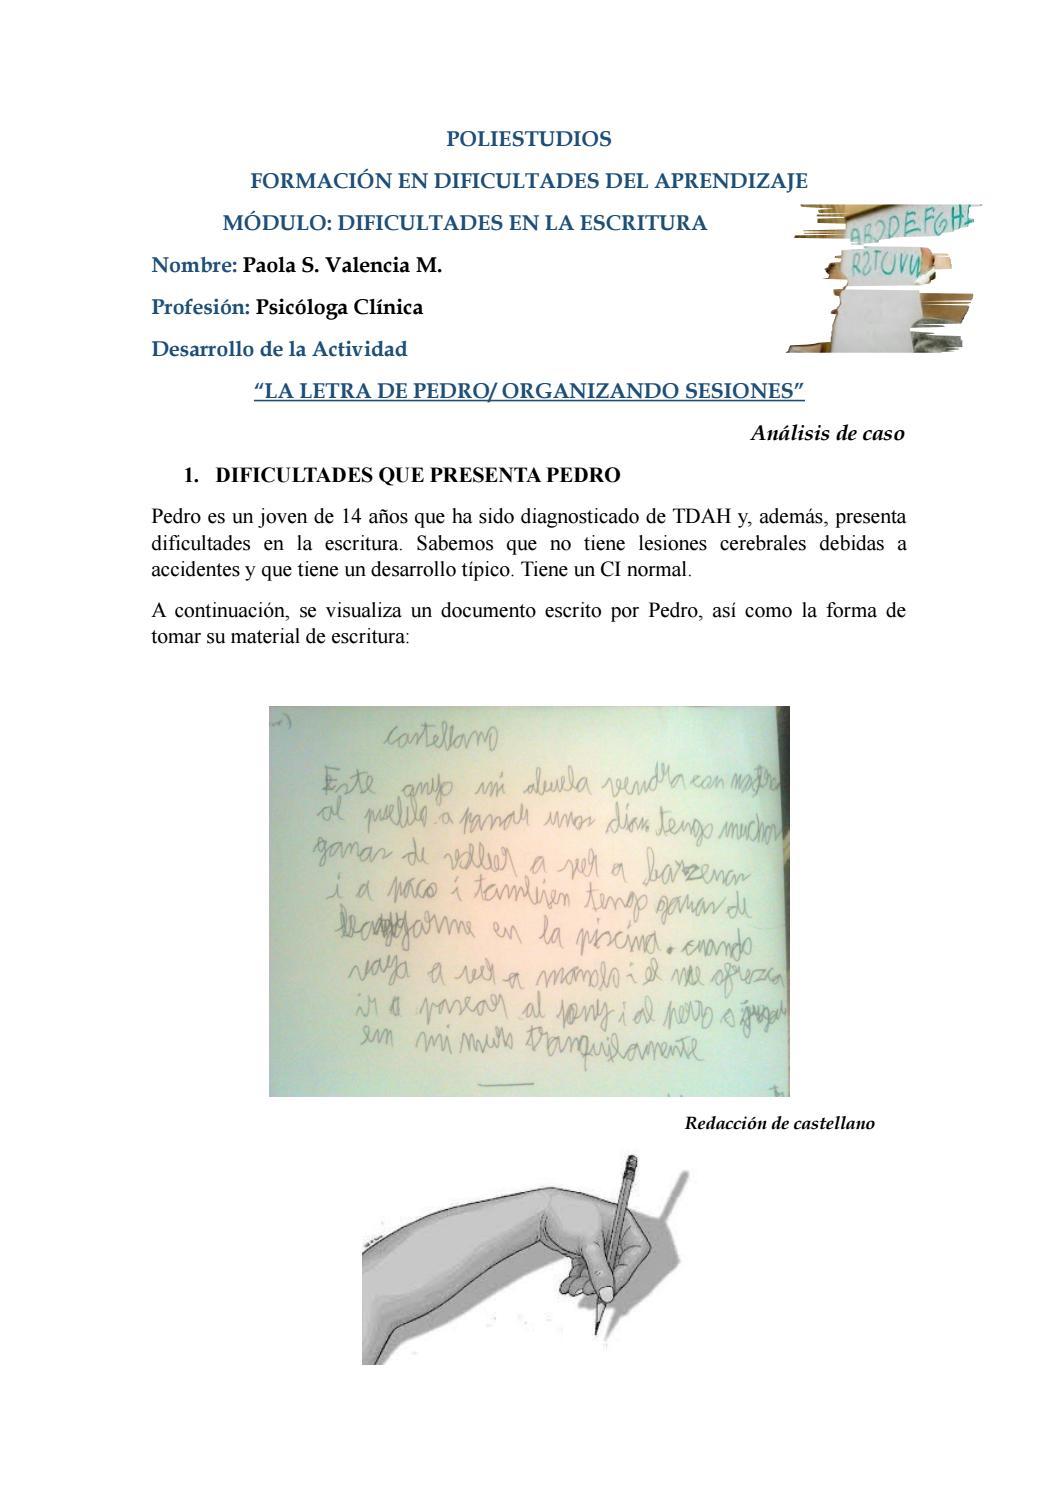 Organizando sesiones by PAOLA VALENCIA - issuu